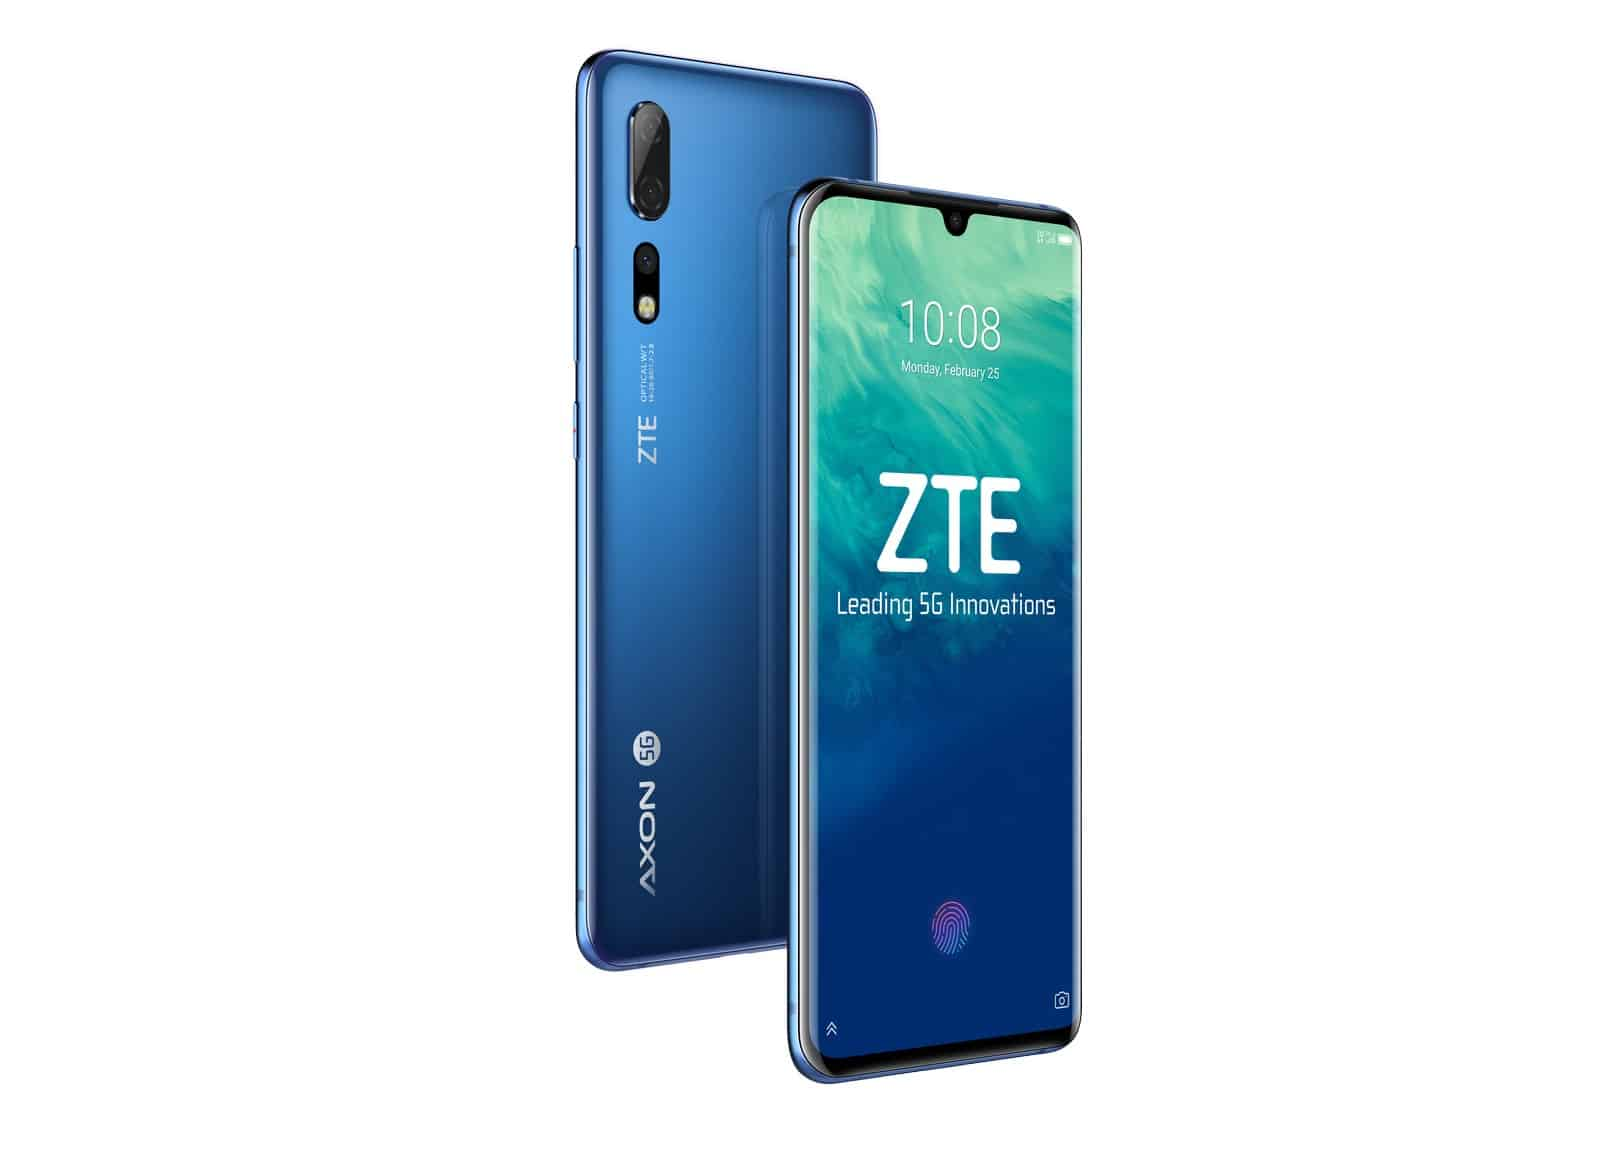 ZTE Axon 10 Pro 5G image 1